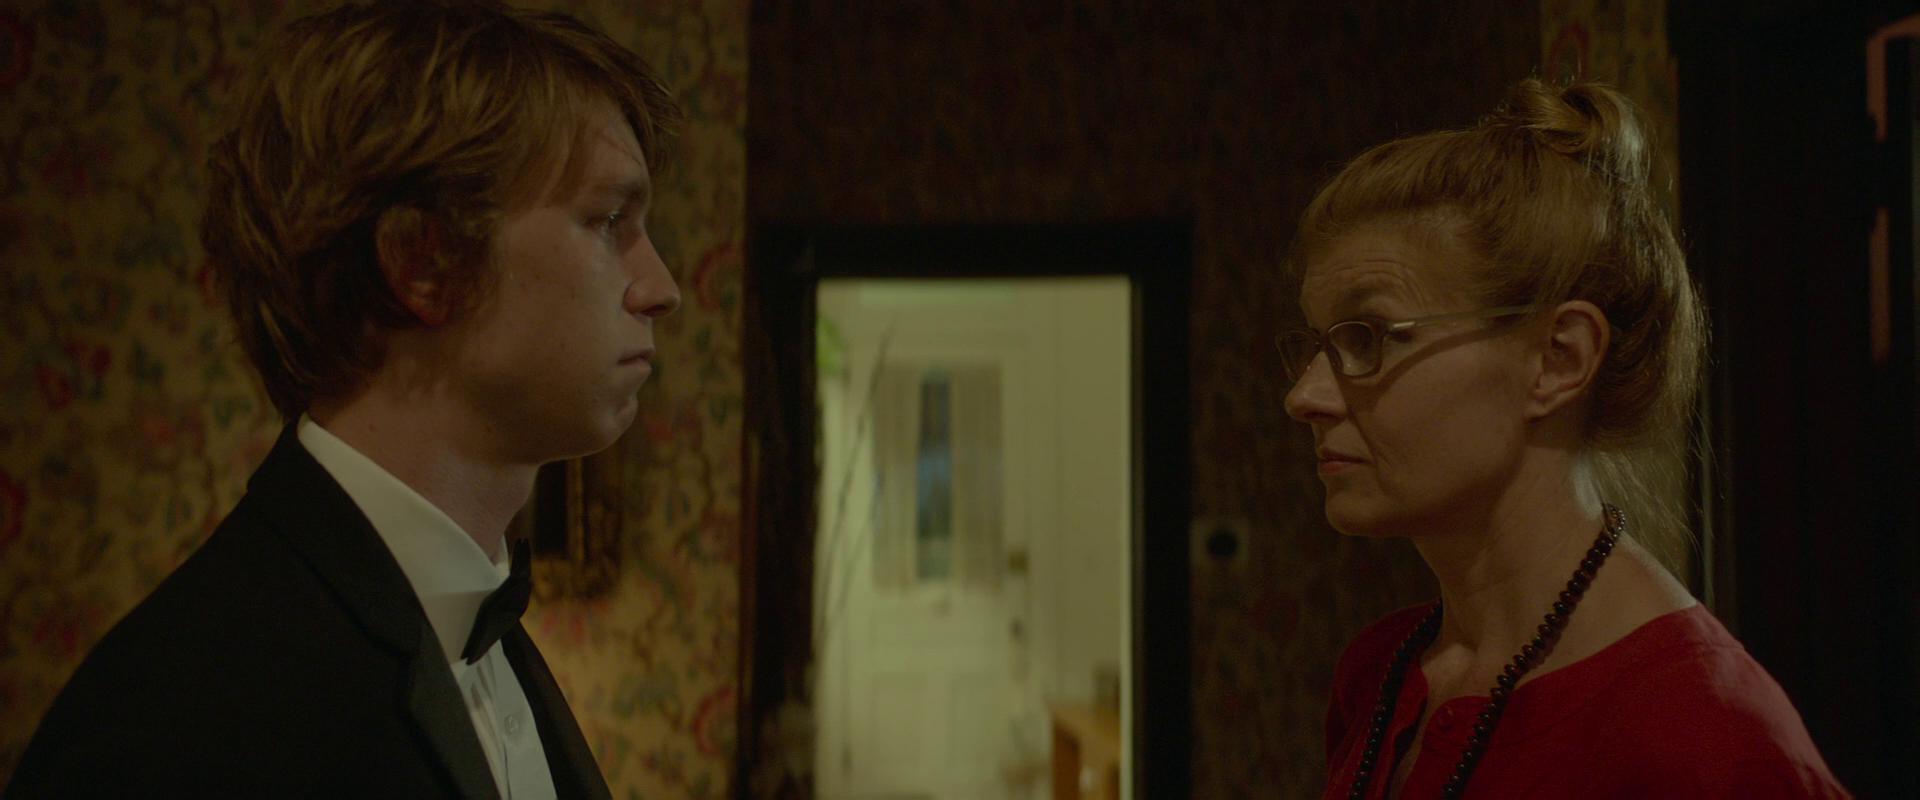 Ben, Earl ve Ölen Kız - Me, Earl and the Dying Girl 2015 (1080p BluRay) DUAL TR-EN - Full  HD Film indir